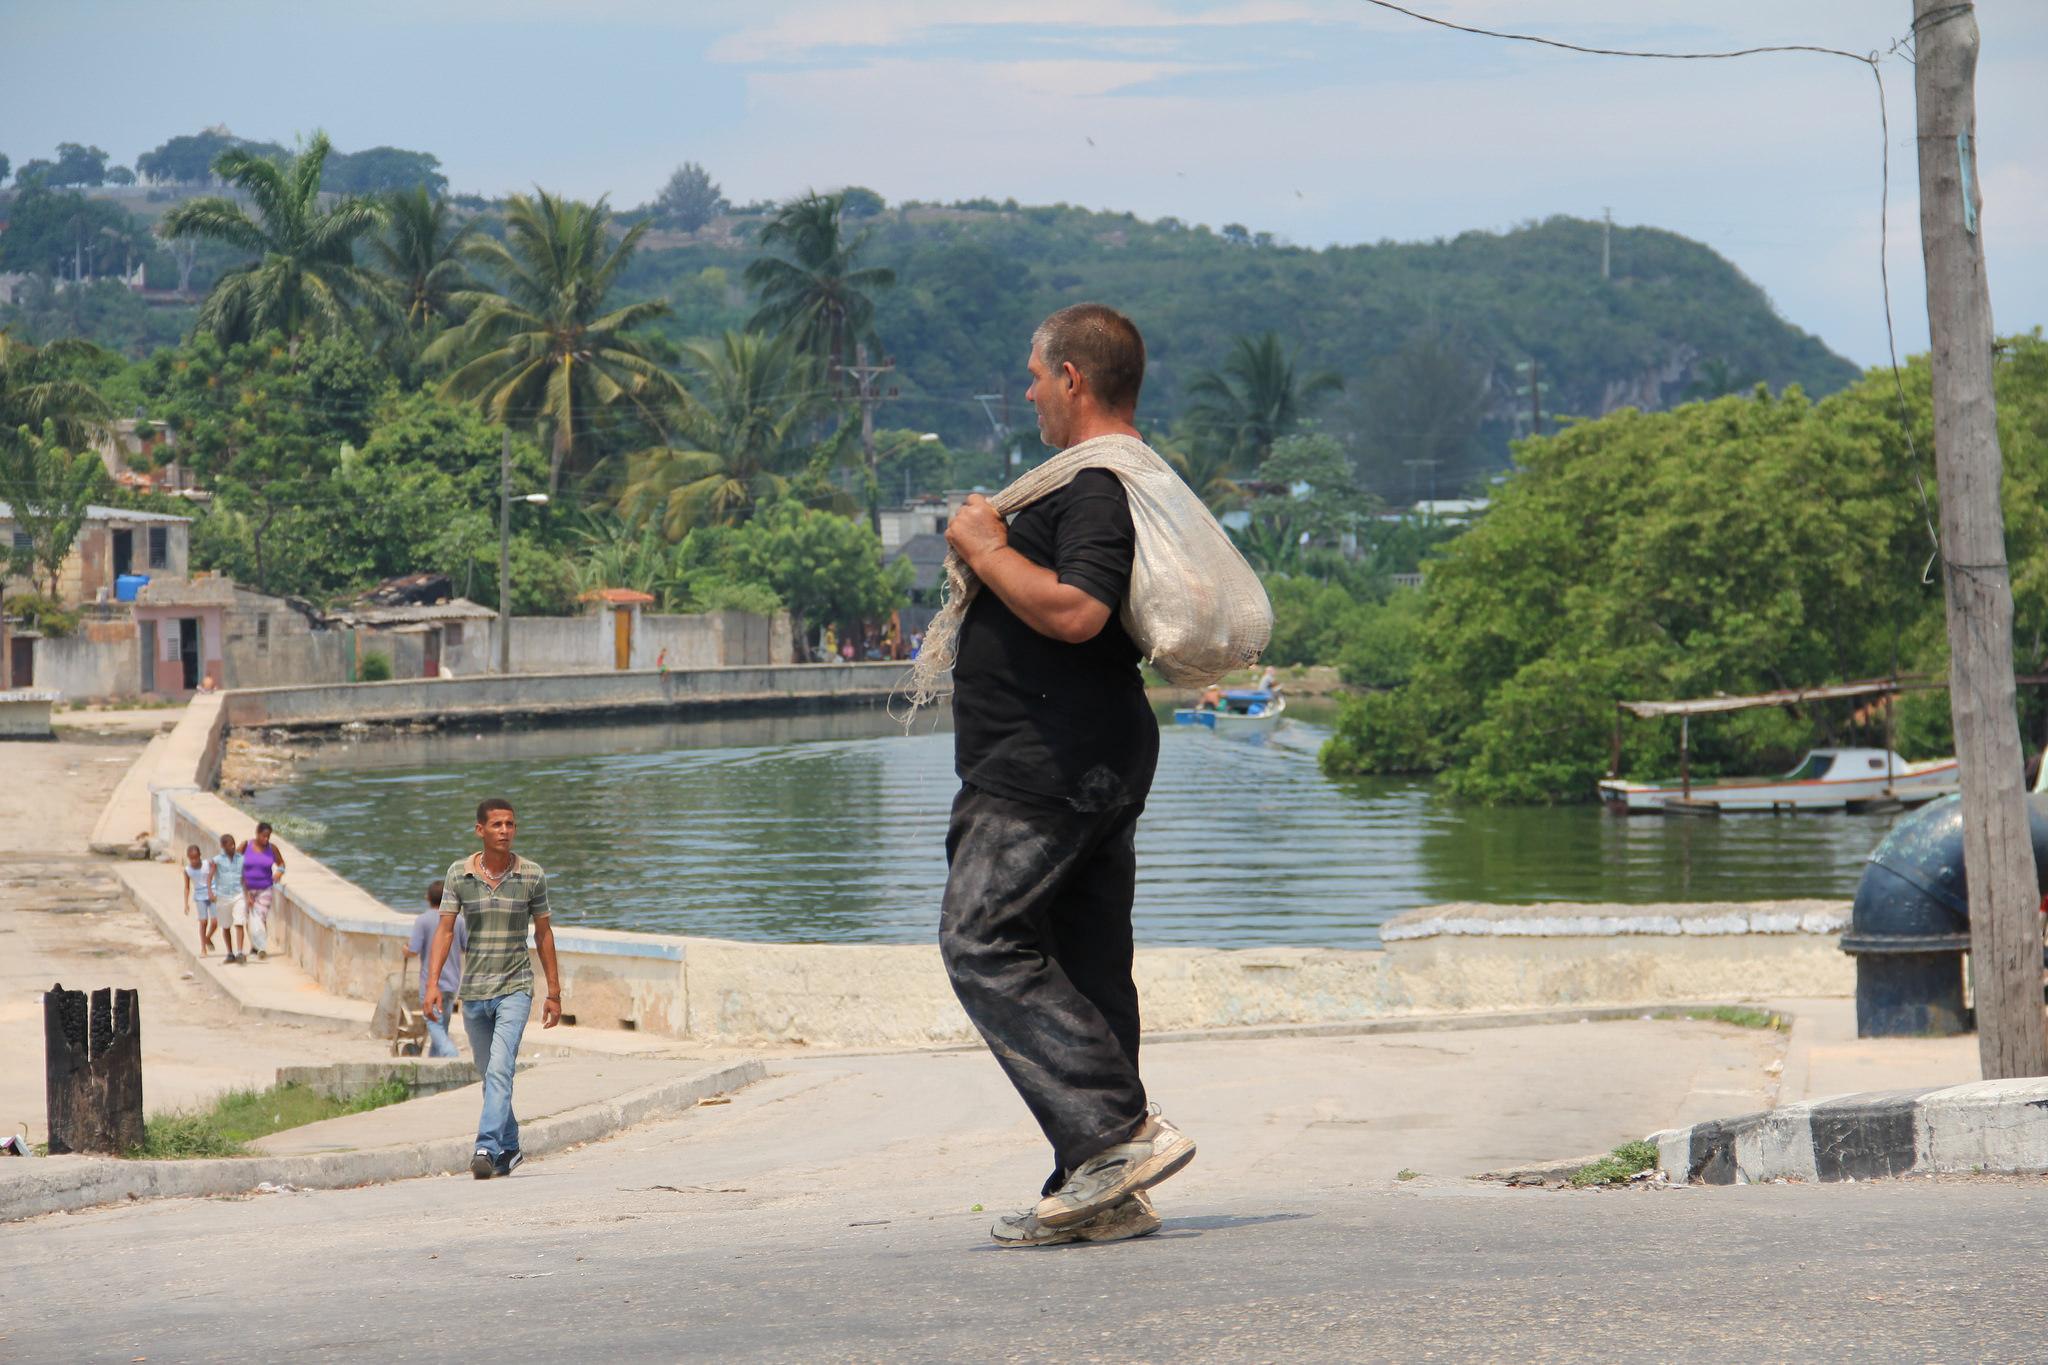 street life in Matanza, Cuba